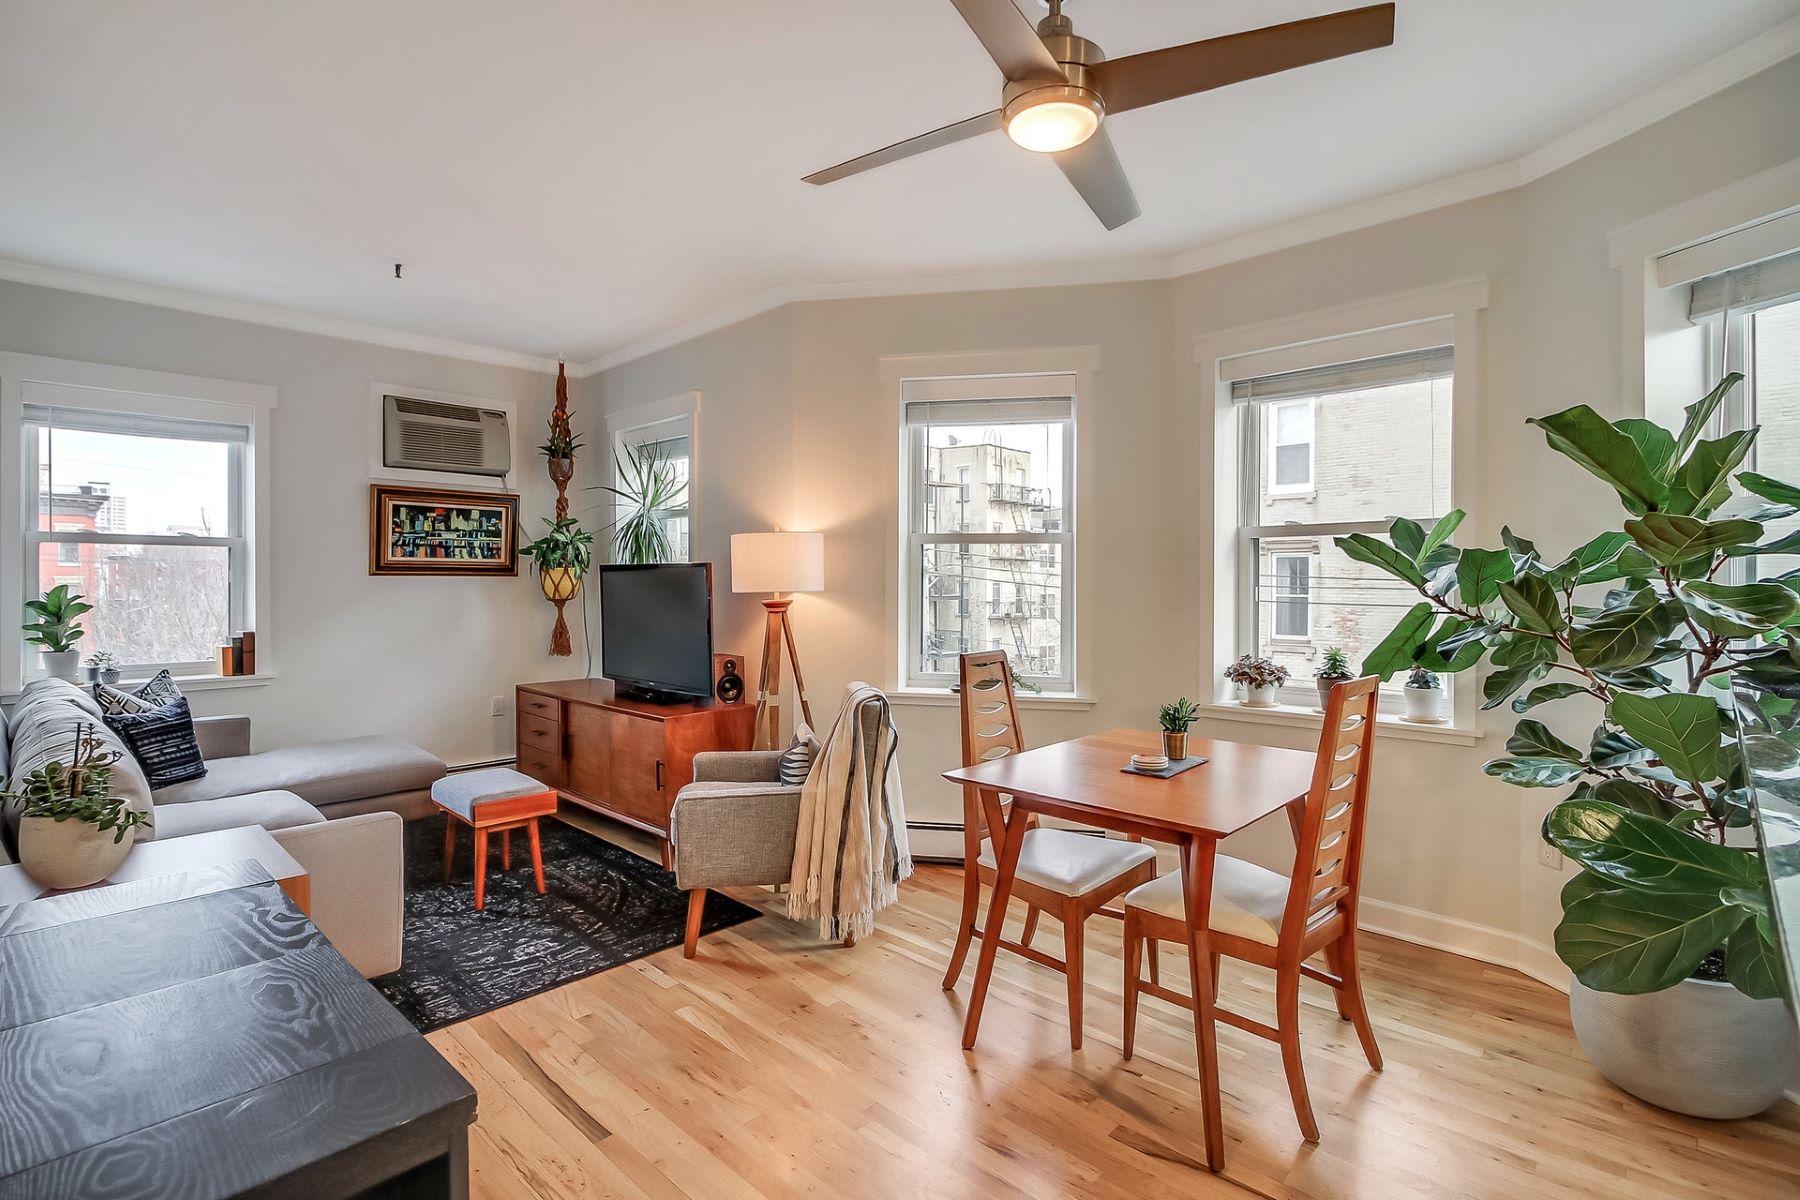 Condominiums 为 销售 在 Downtown Hoboken two bedroom condo 301 Monroe Street #3R, 霍博肯, 新泽西州 07030 美国